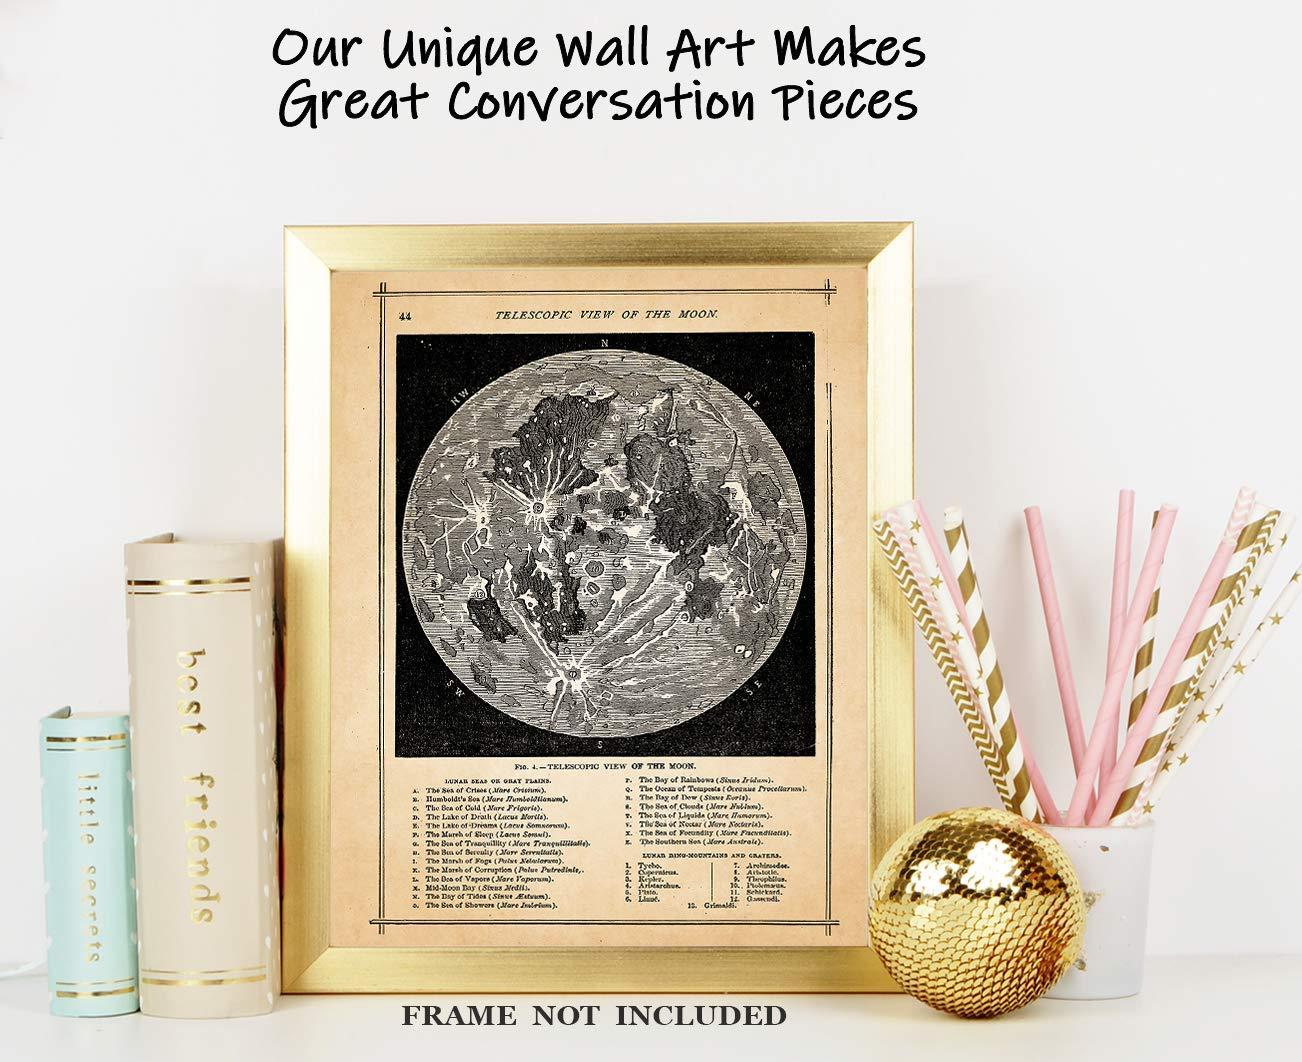 Vintage Full Moon Map Wall Art Print - (24x24) Photo Unframed Make Great  Room Wall Decor Gift Idea Under $24